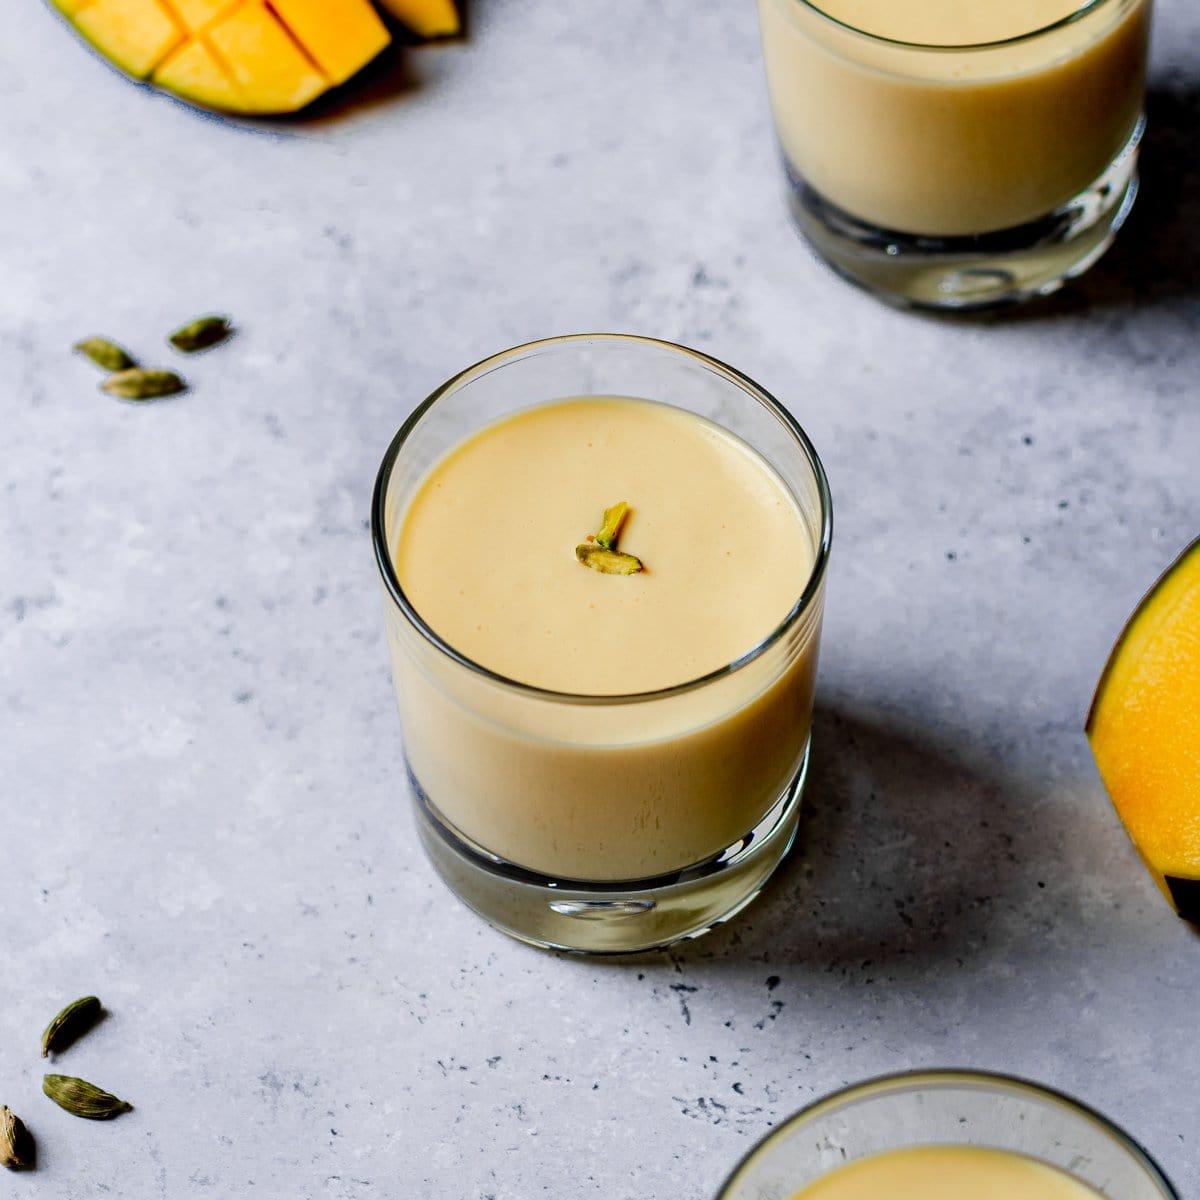 Glass of mango lassi